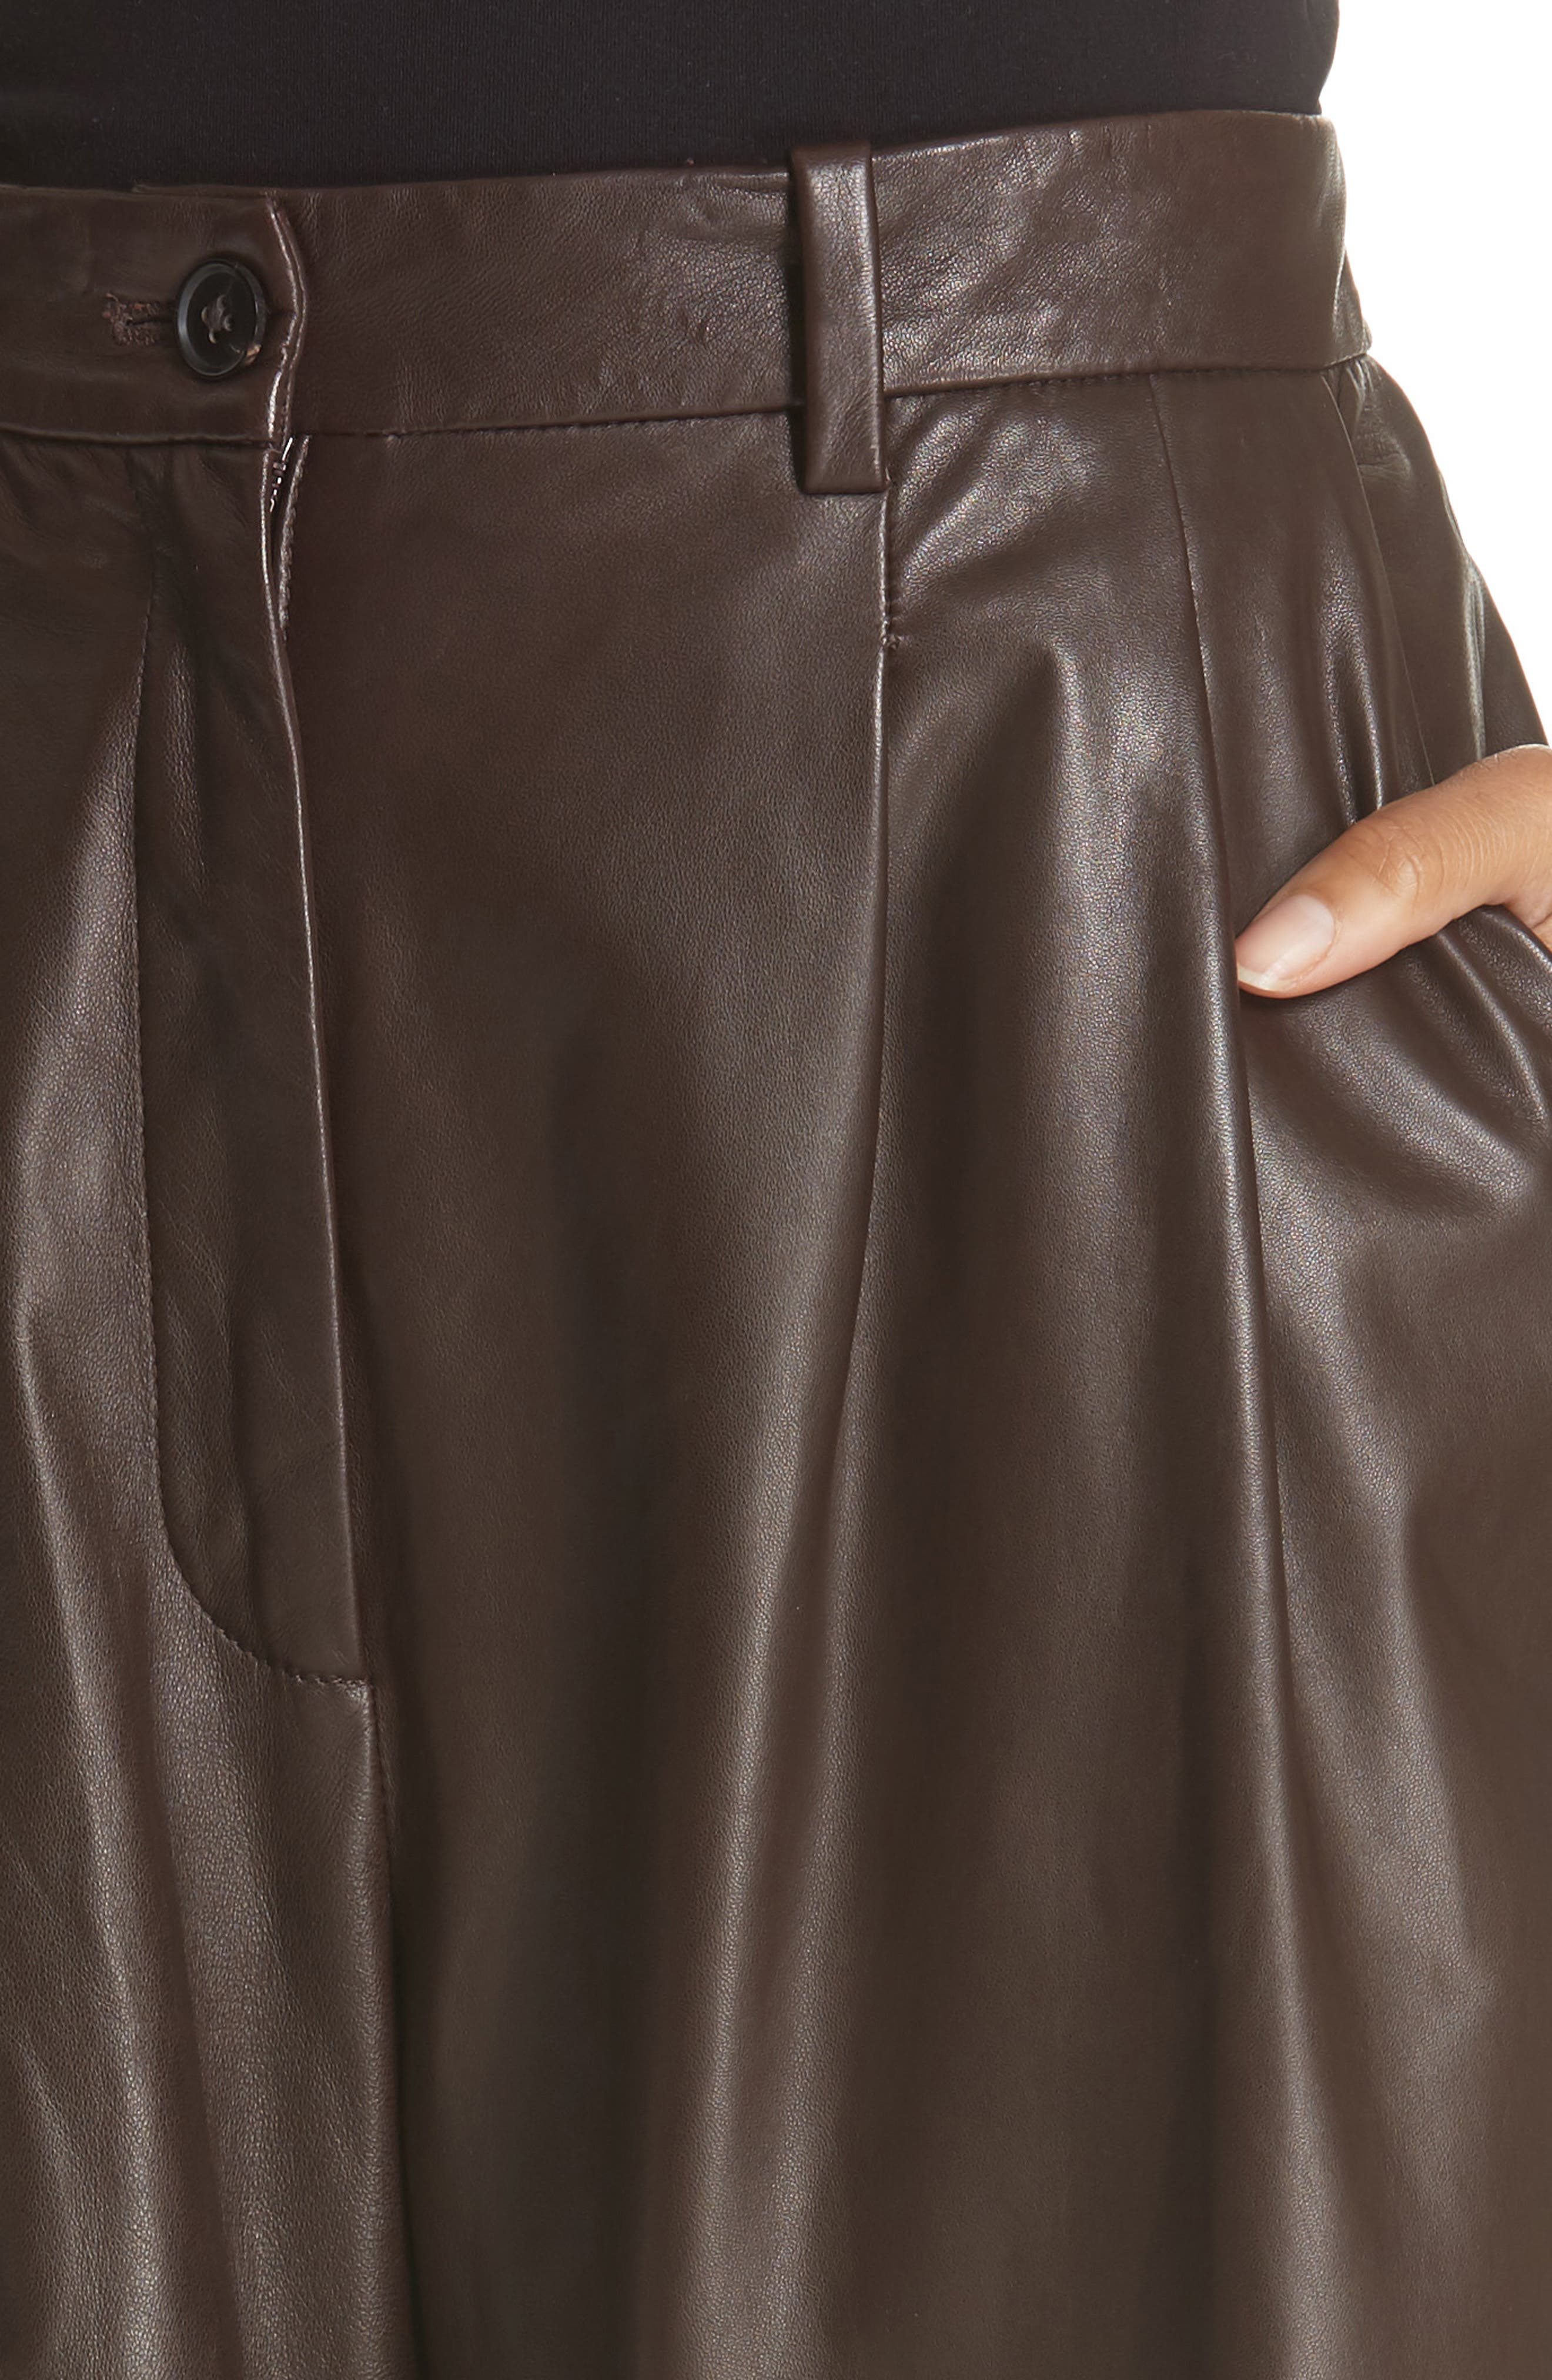 NILI LOTAN, Nico Leather Pants, Alternate thumbnail 4, color, BROWN